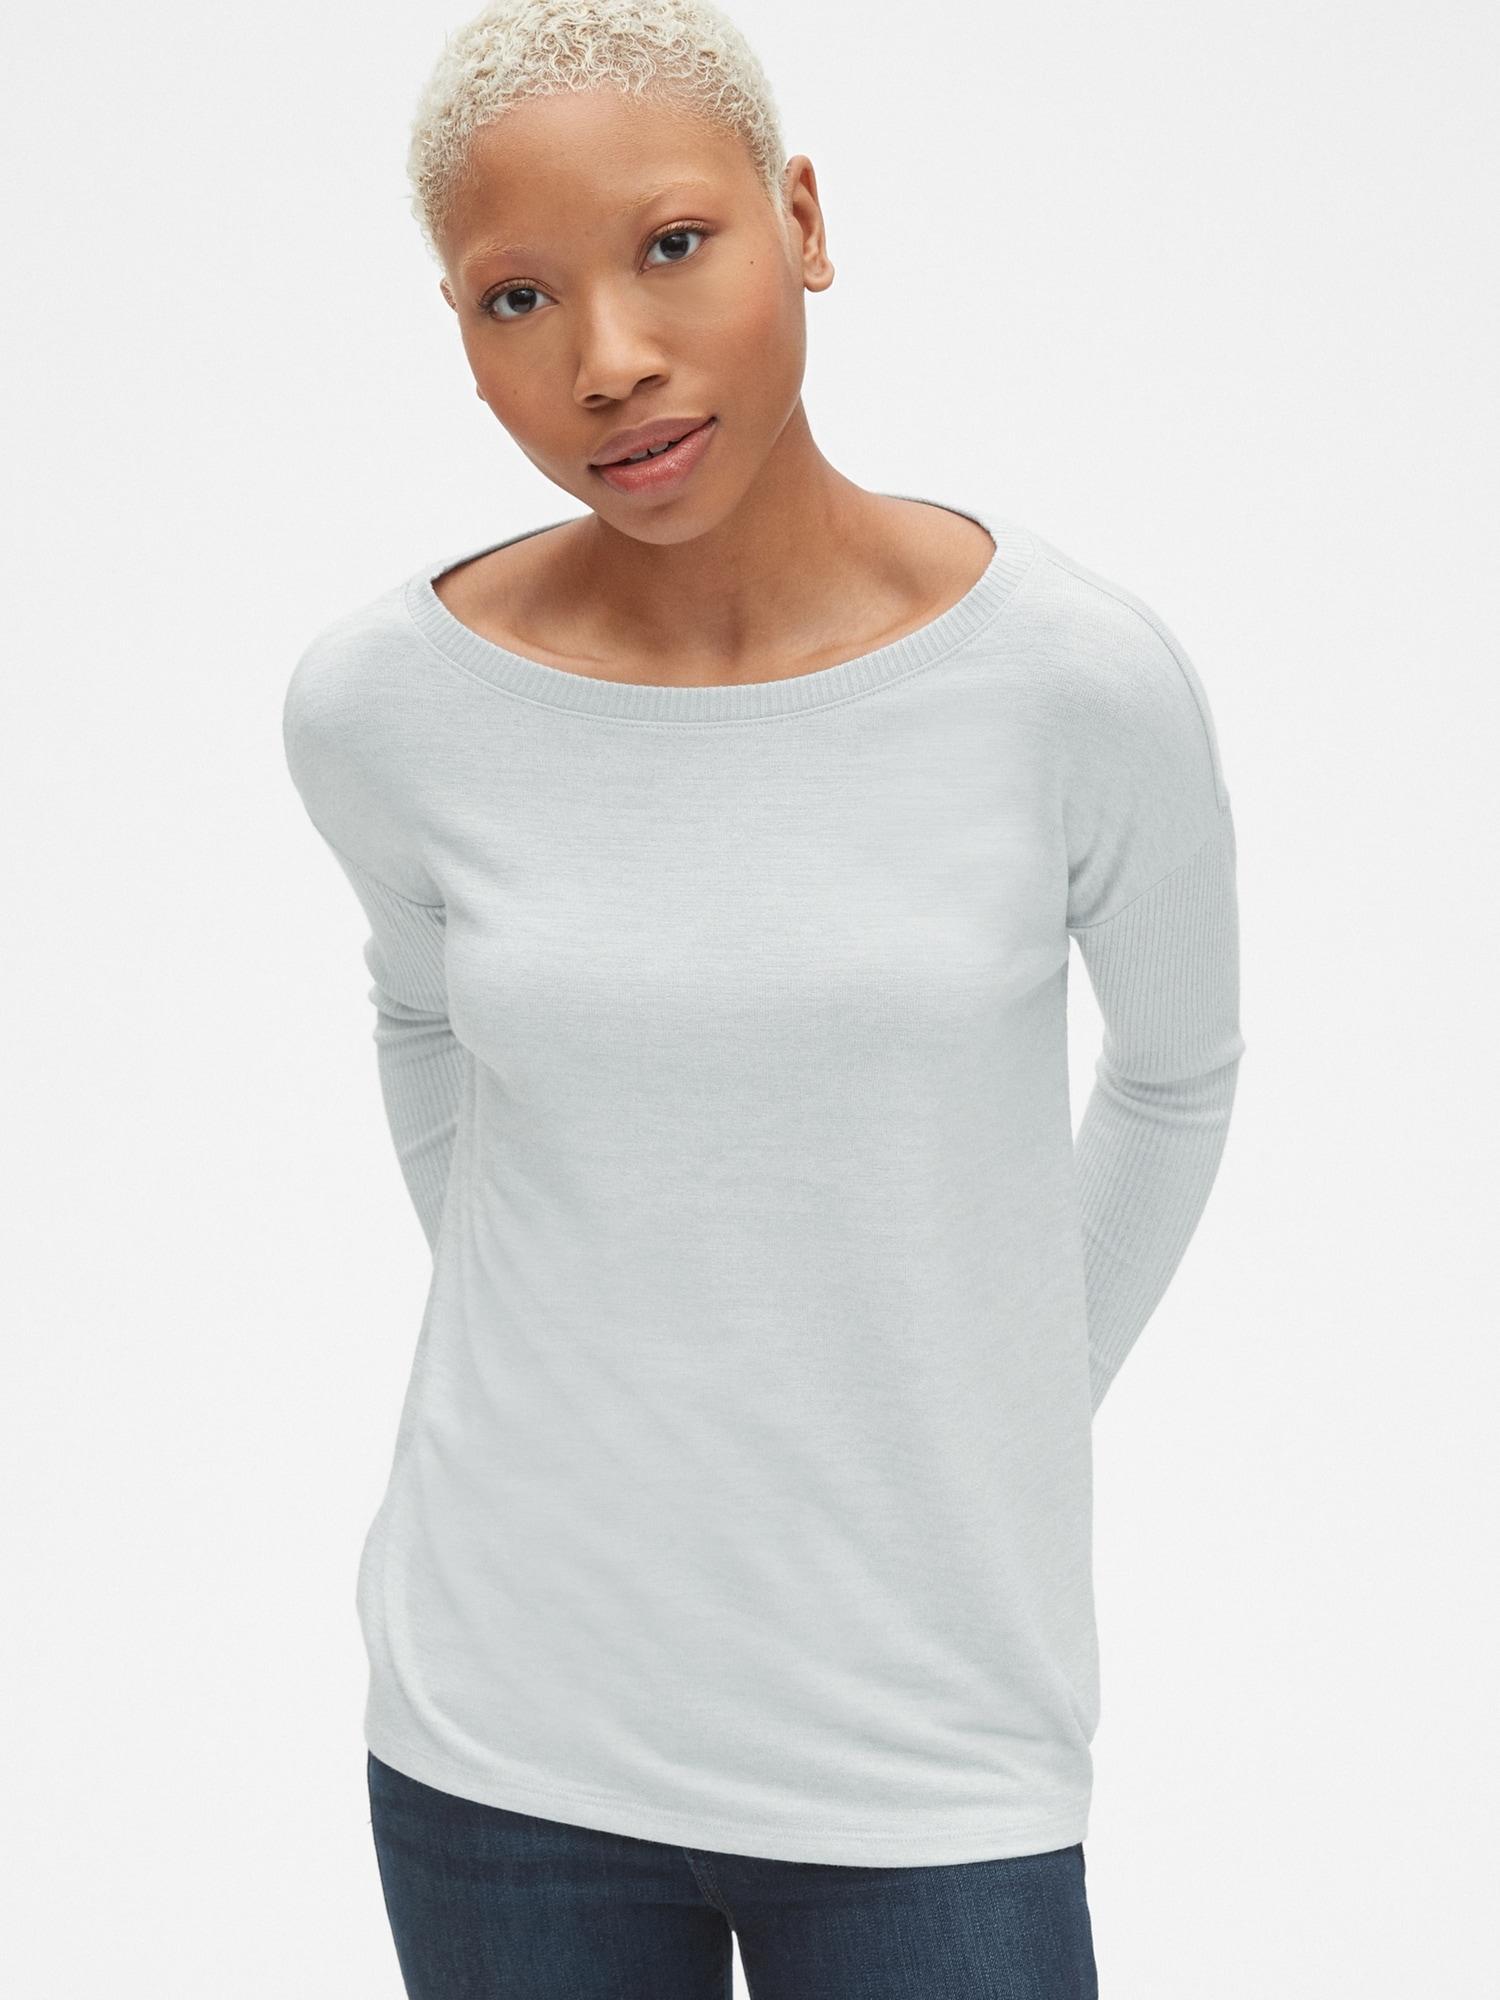 416b7438fcfba Lyst - Gap Softspun Mix-fabric Long Sleeve Top in Gray